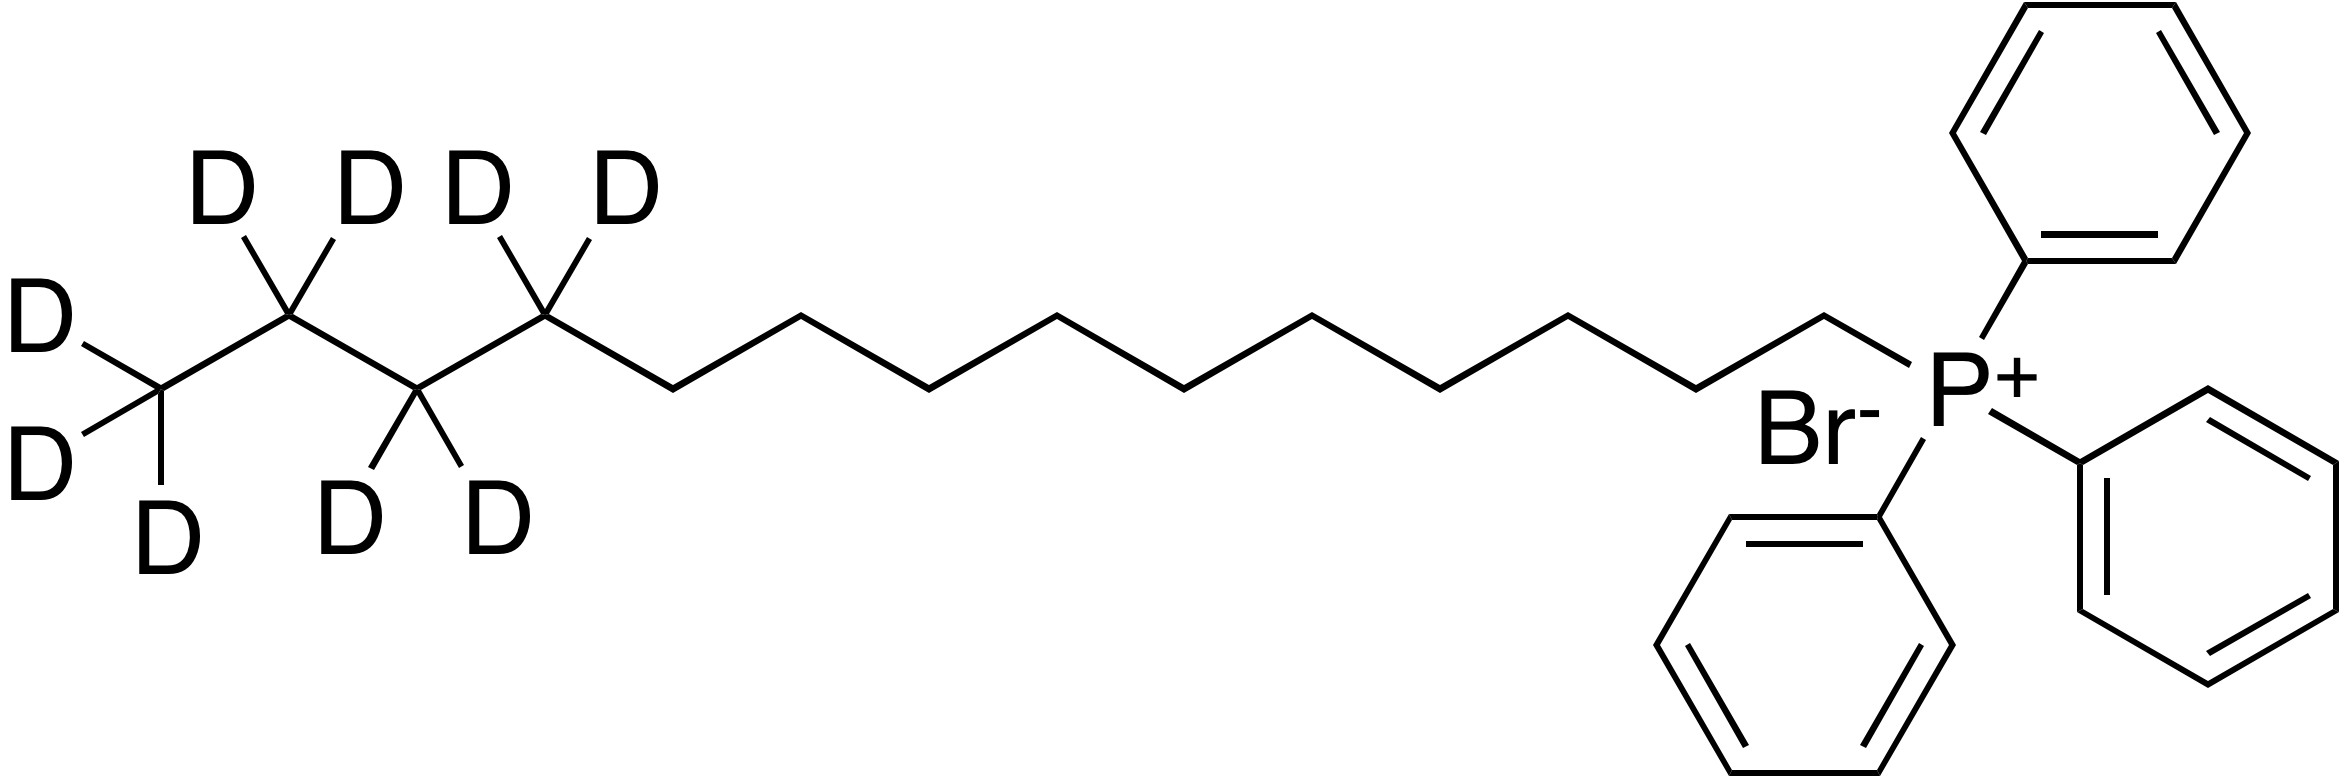 (1-Tetradecyl)-d<sub>9</sub> triphenylphosphonium bromide